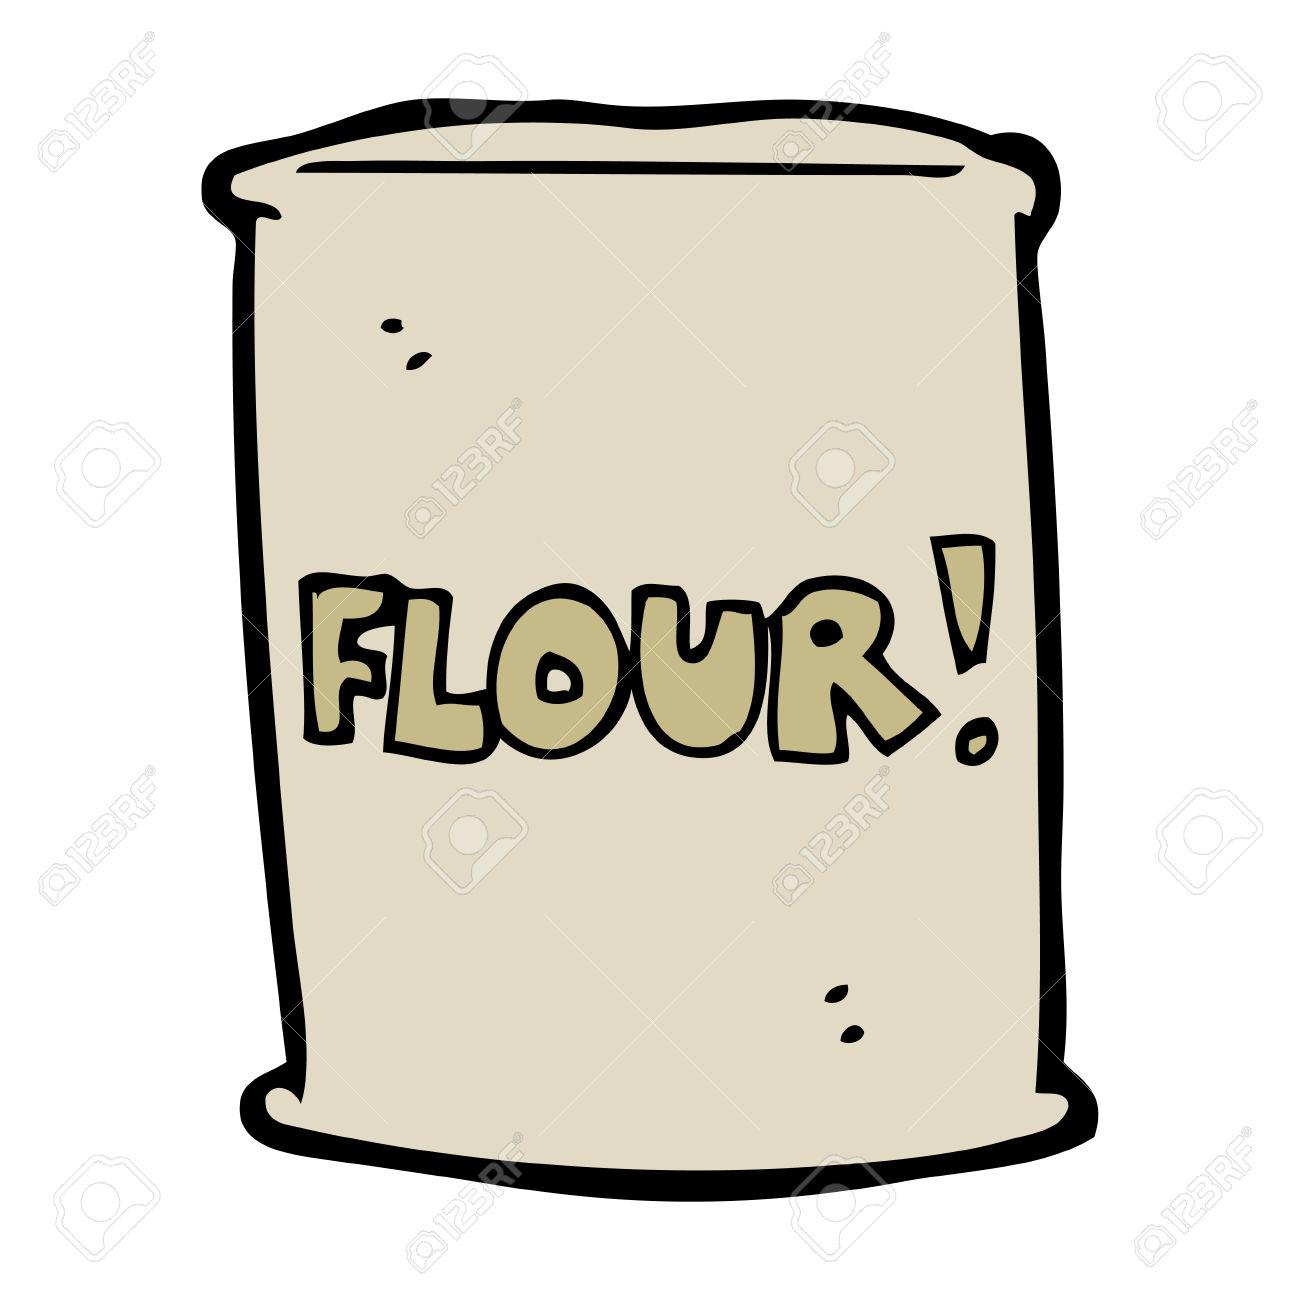 Flour Clipart.